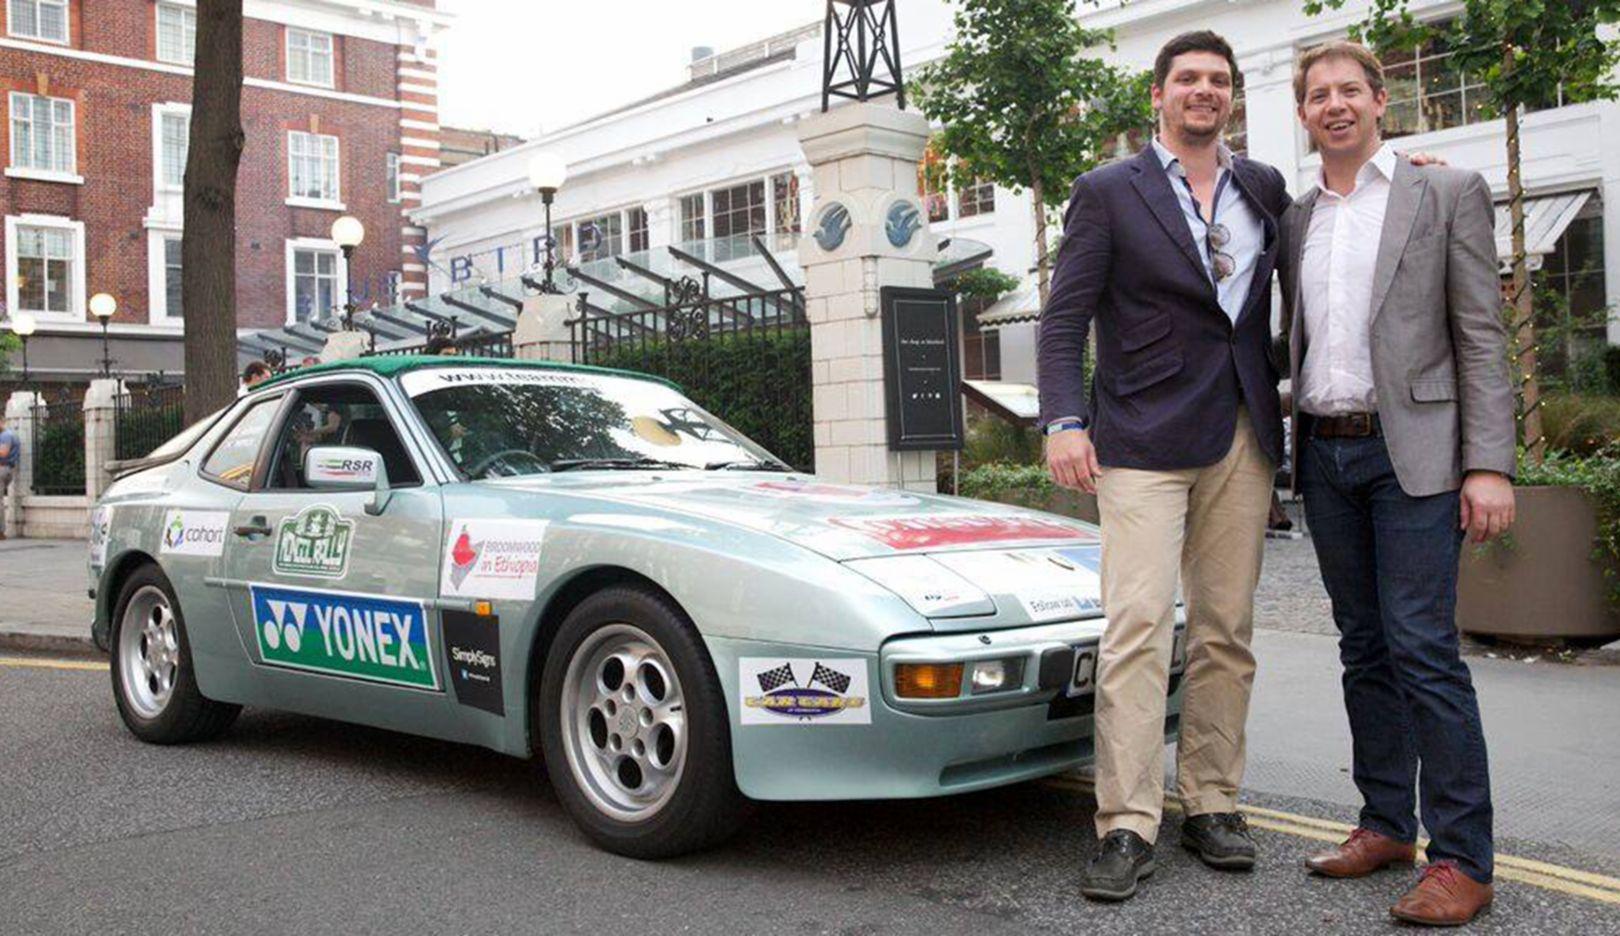 Patrick Colquhoun, Anthony Millet (l.-r.), Mongol-Rallye Fahrer, 1986 Porsche 944, 2015, Porsche AG